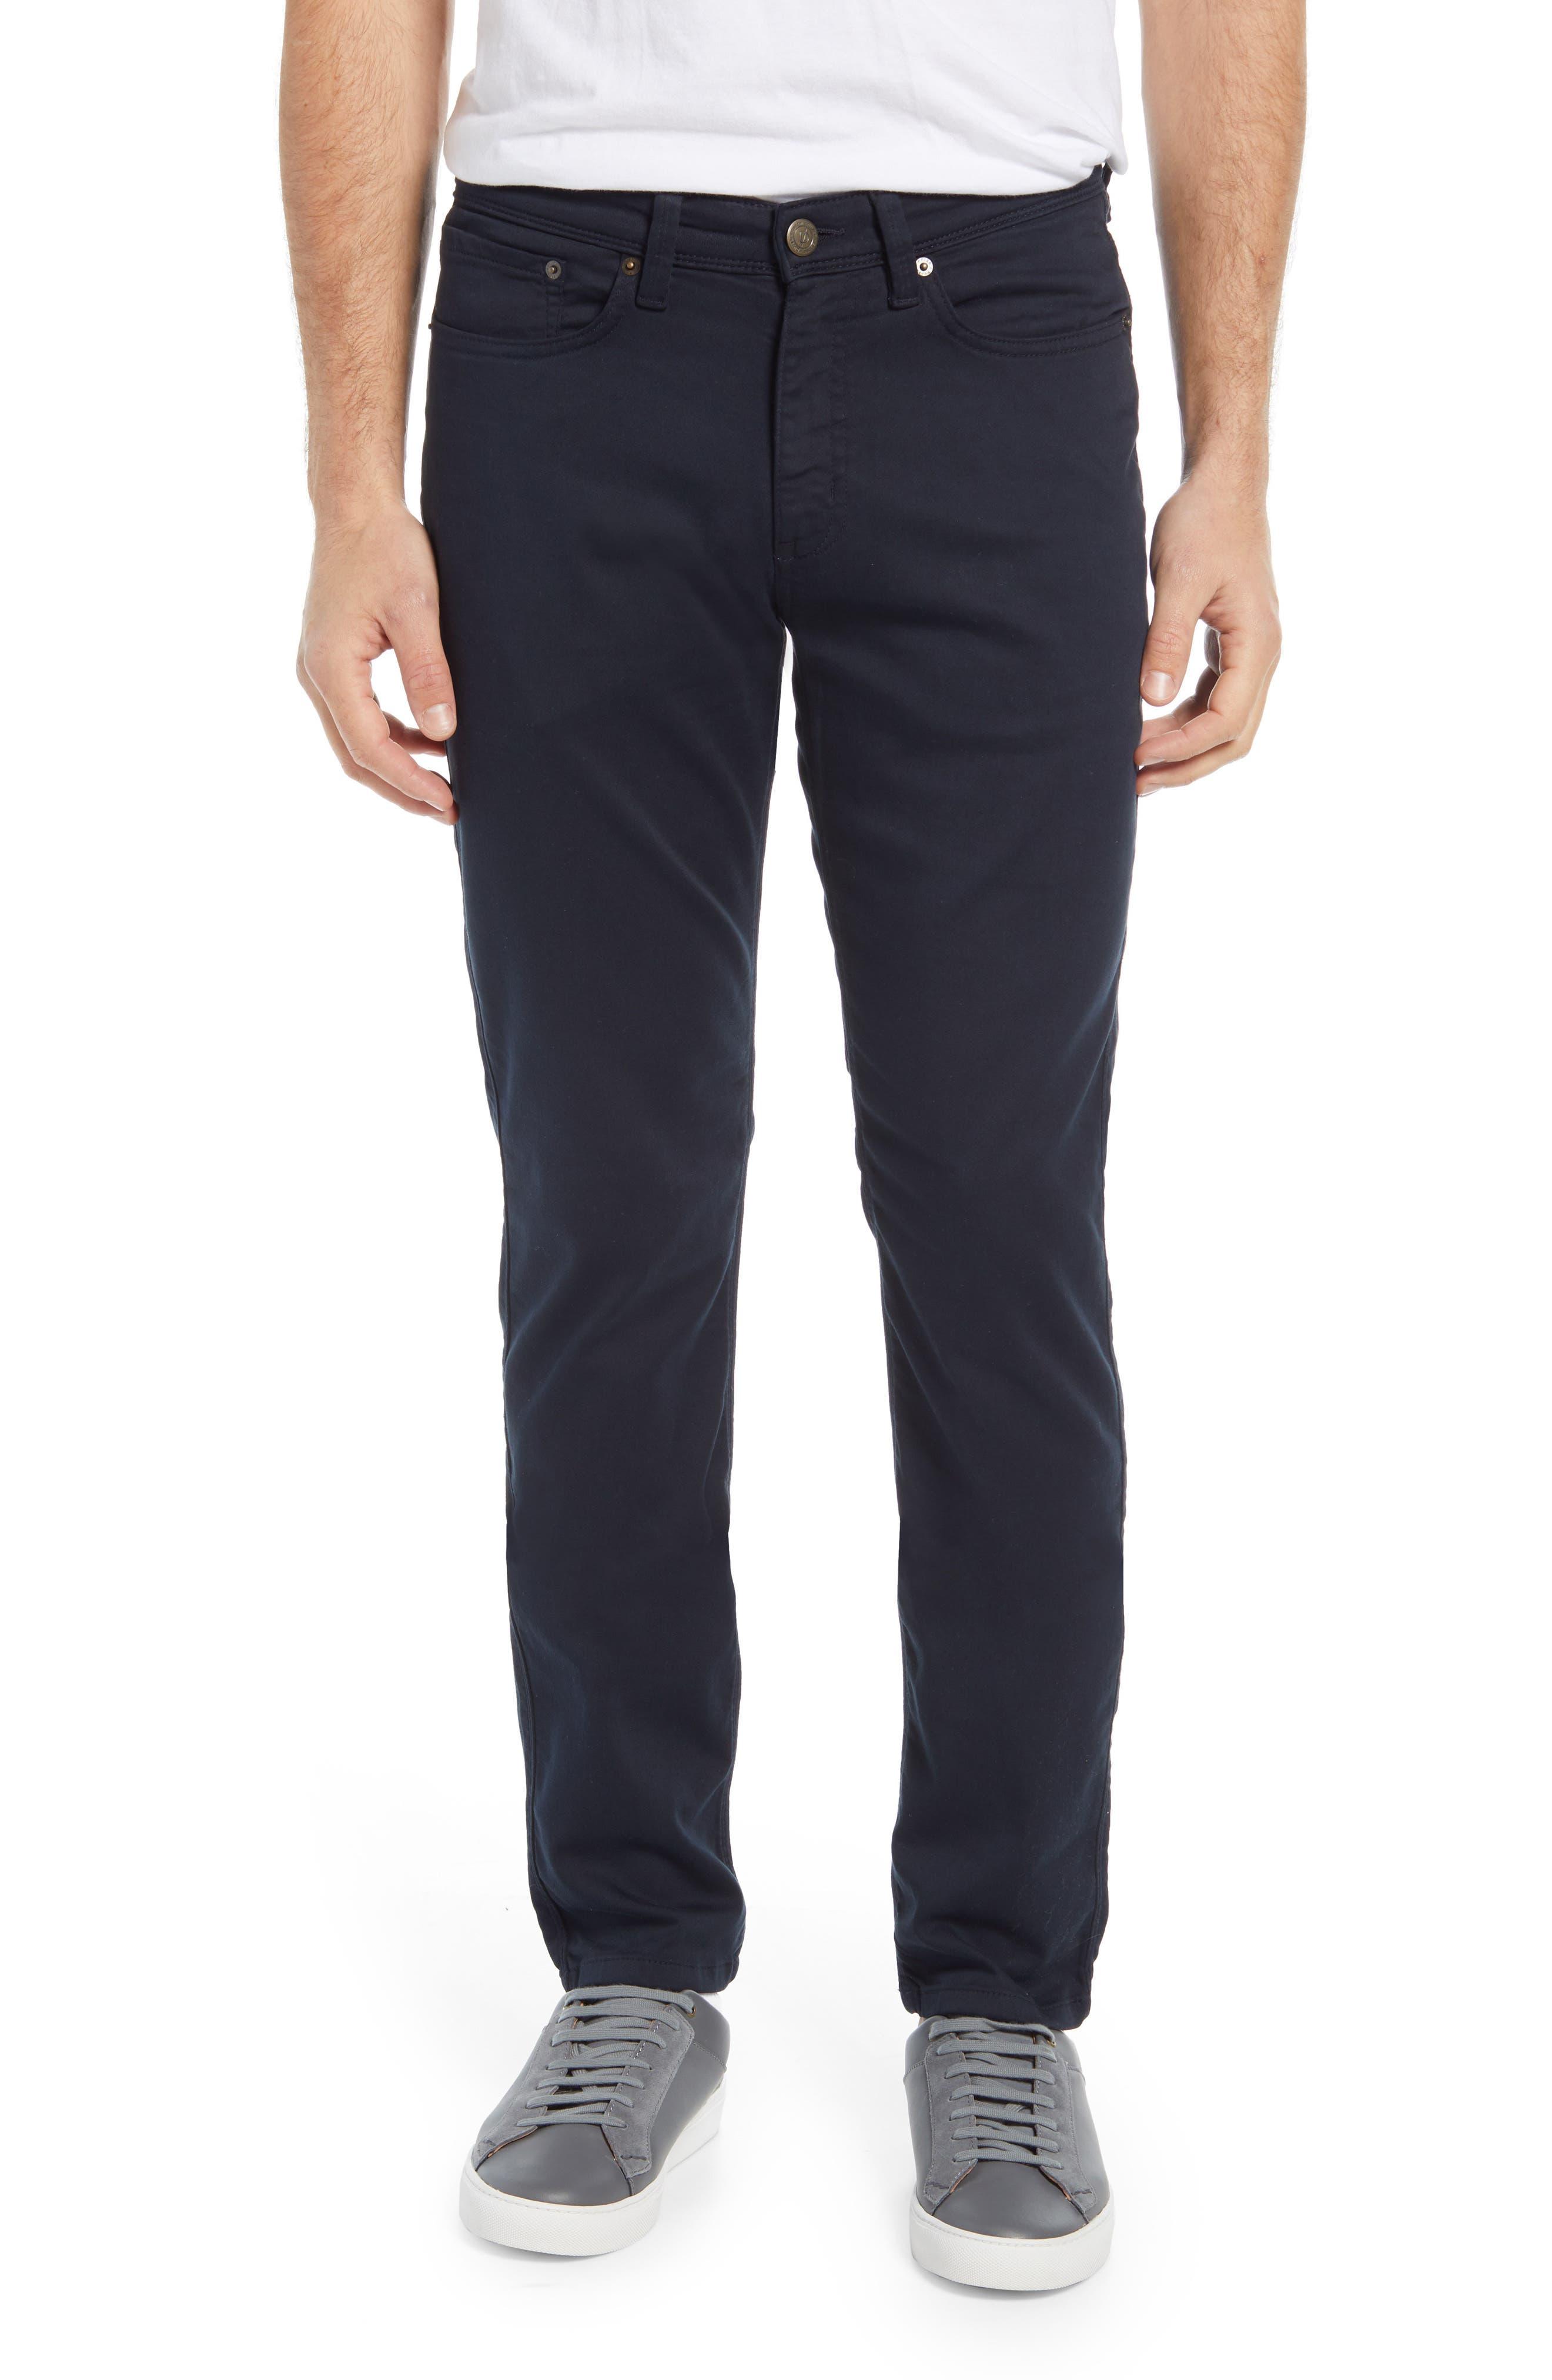 No Sweat Slim Fit Performance Men's Five Pocket Pants